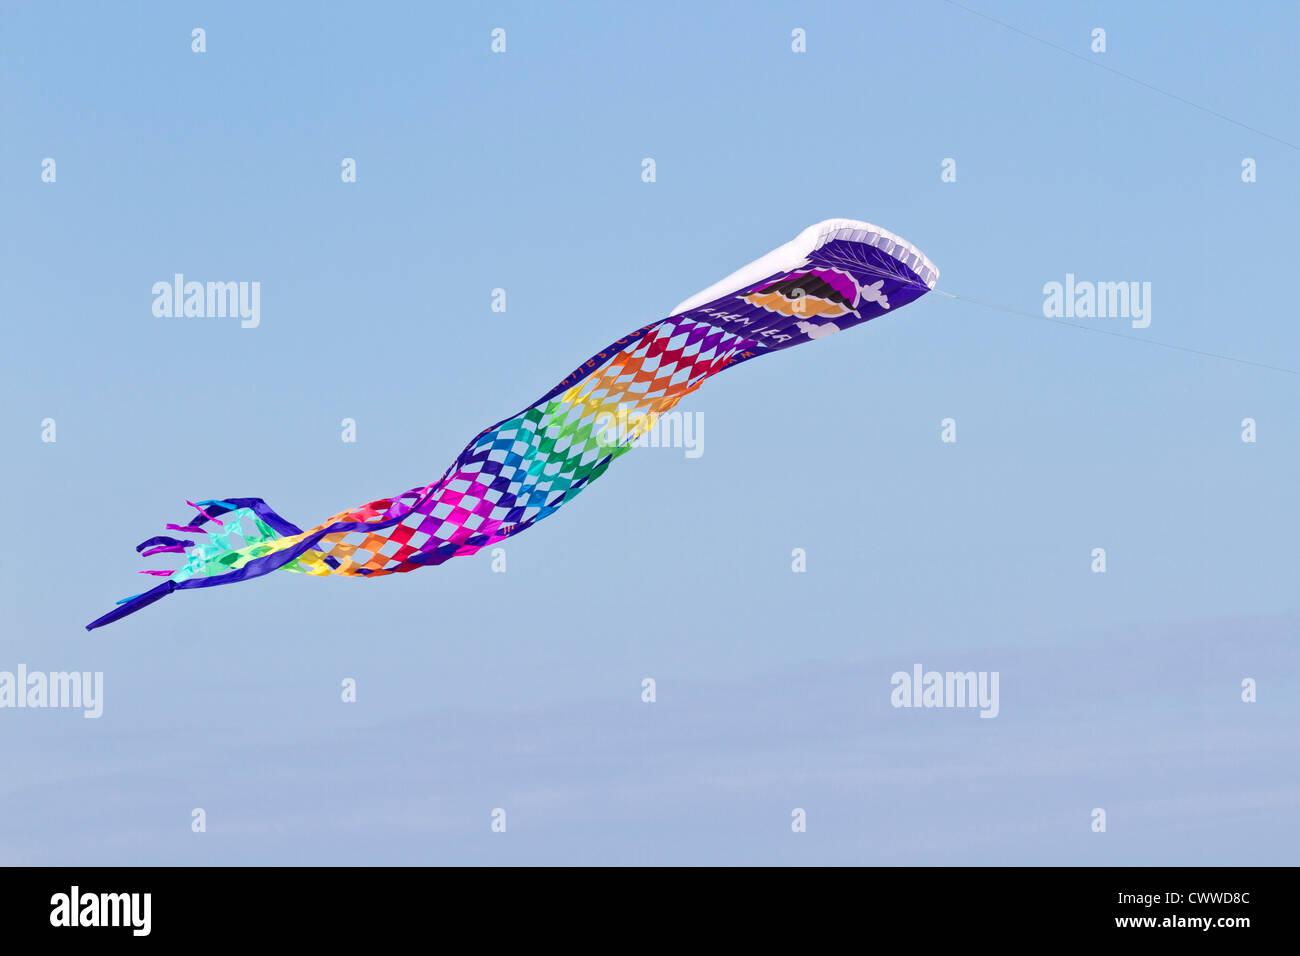 Colorful kite flying at the Treasure Island Kite Festival in Treasure Island, Florida - Stock Image